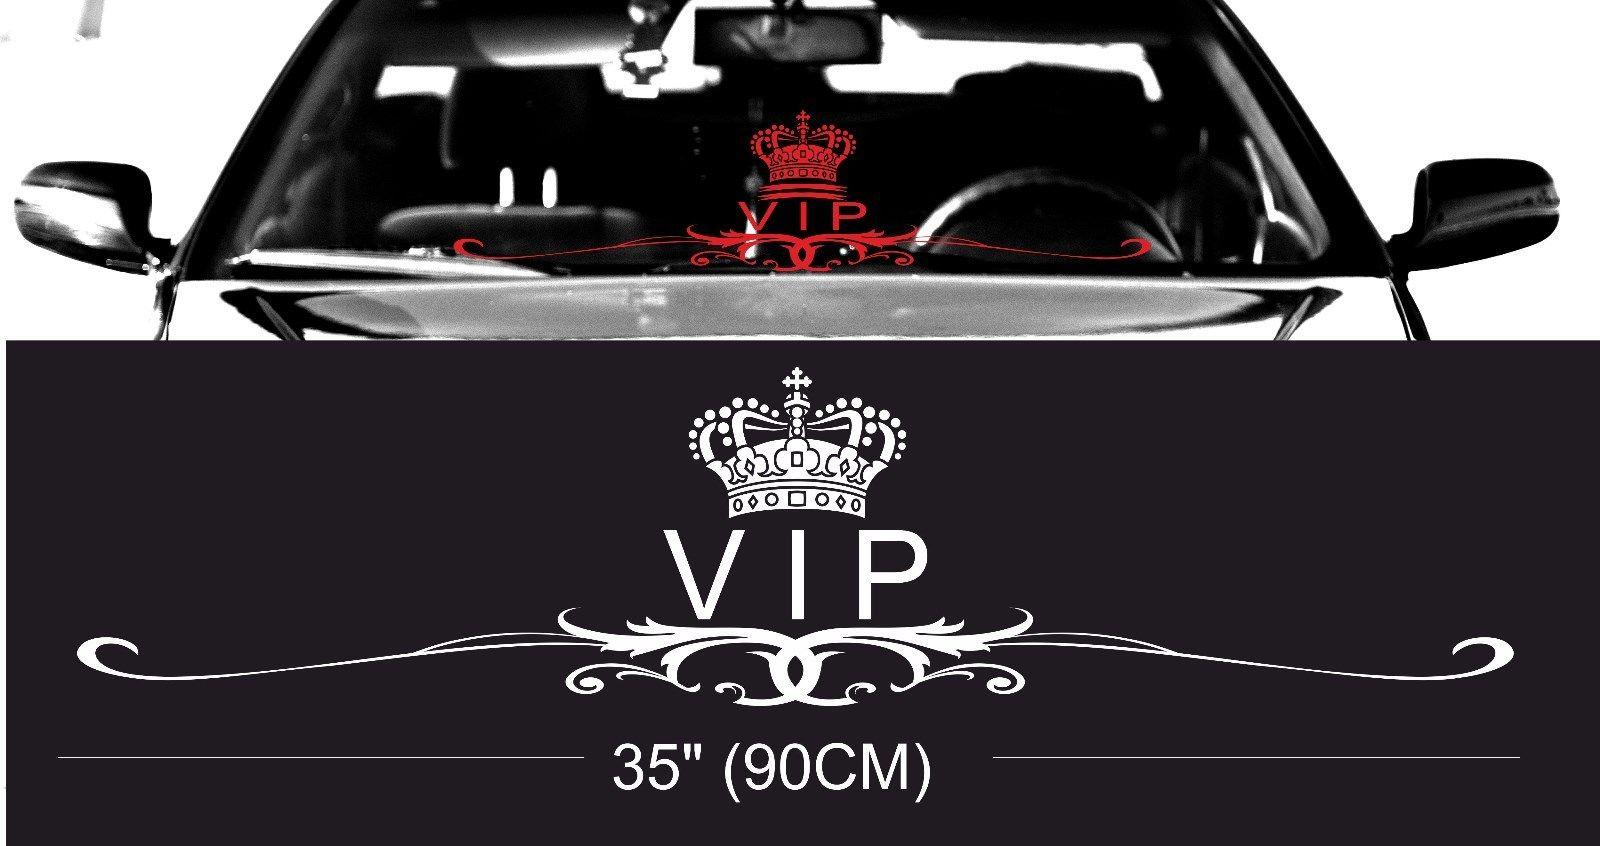 Royal vip classy windshield windscreen front glass car jdm decal sticker